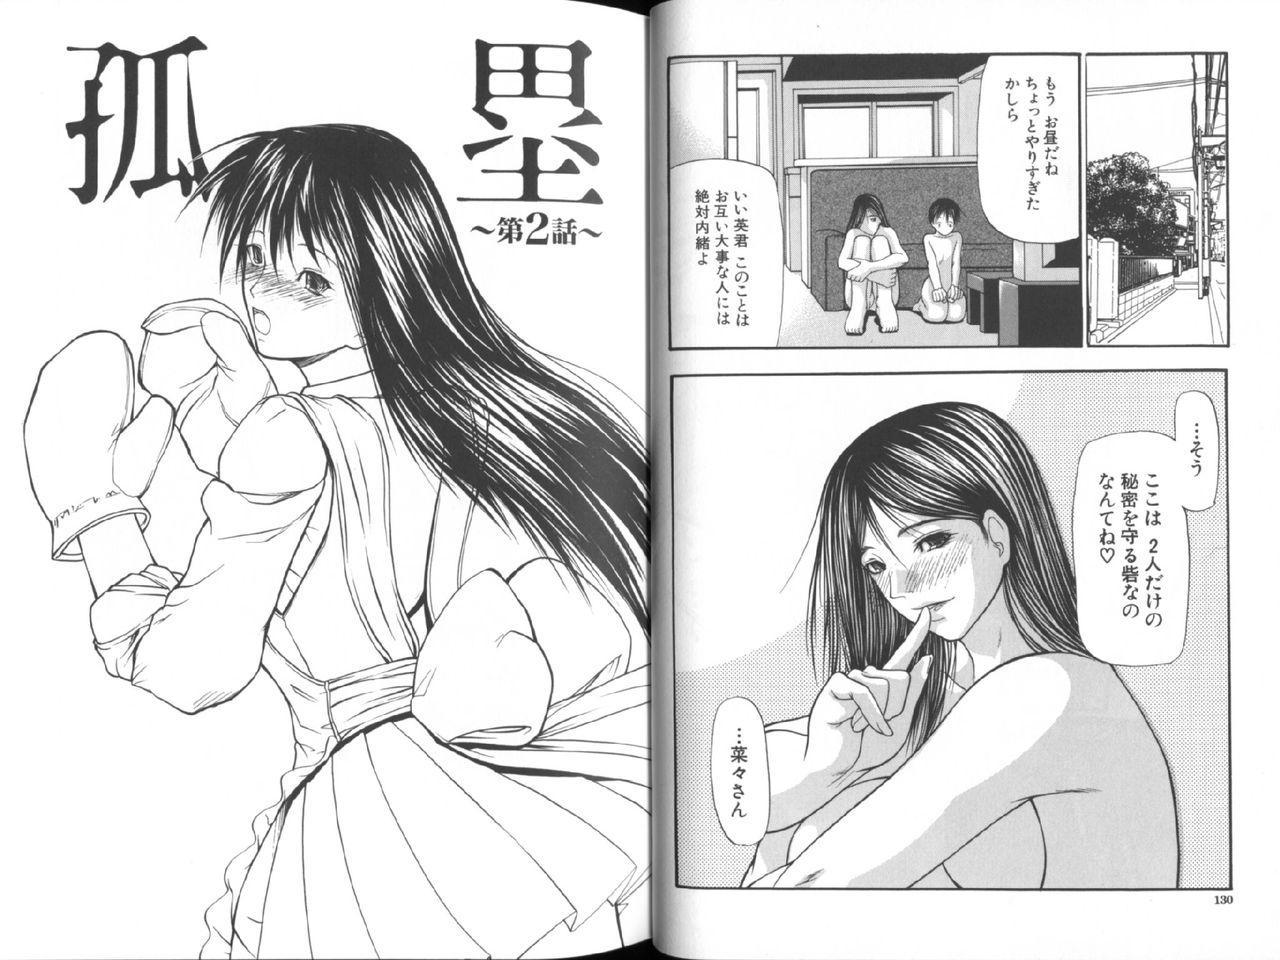 Senjou - A Desire is Instigated 66